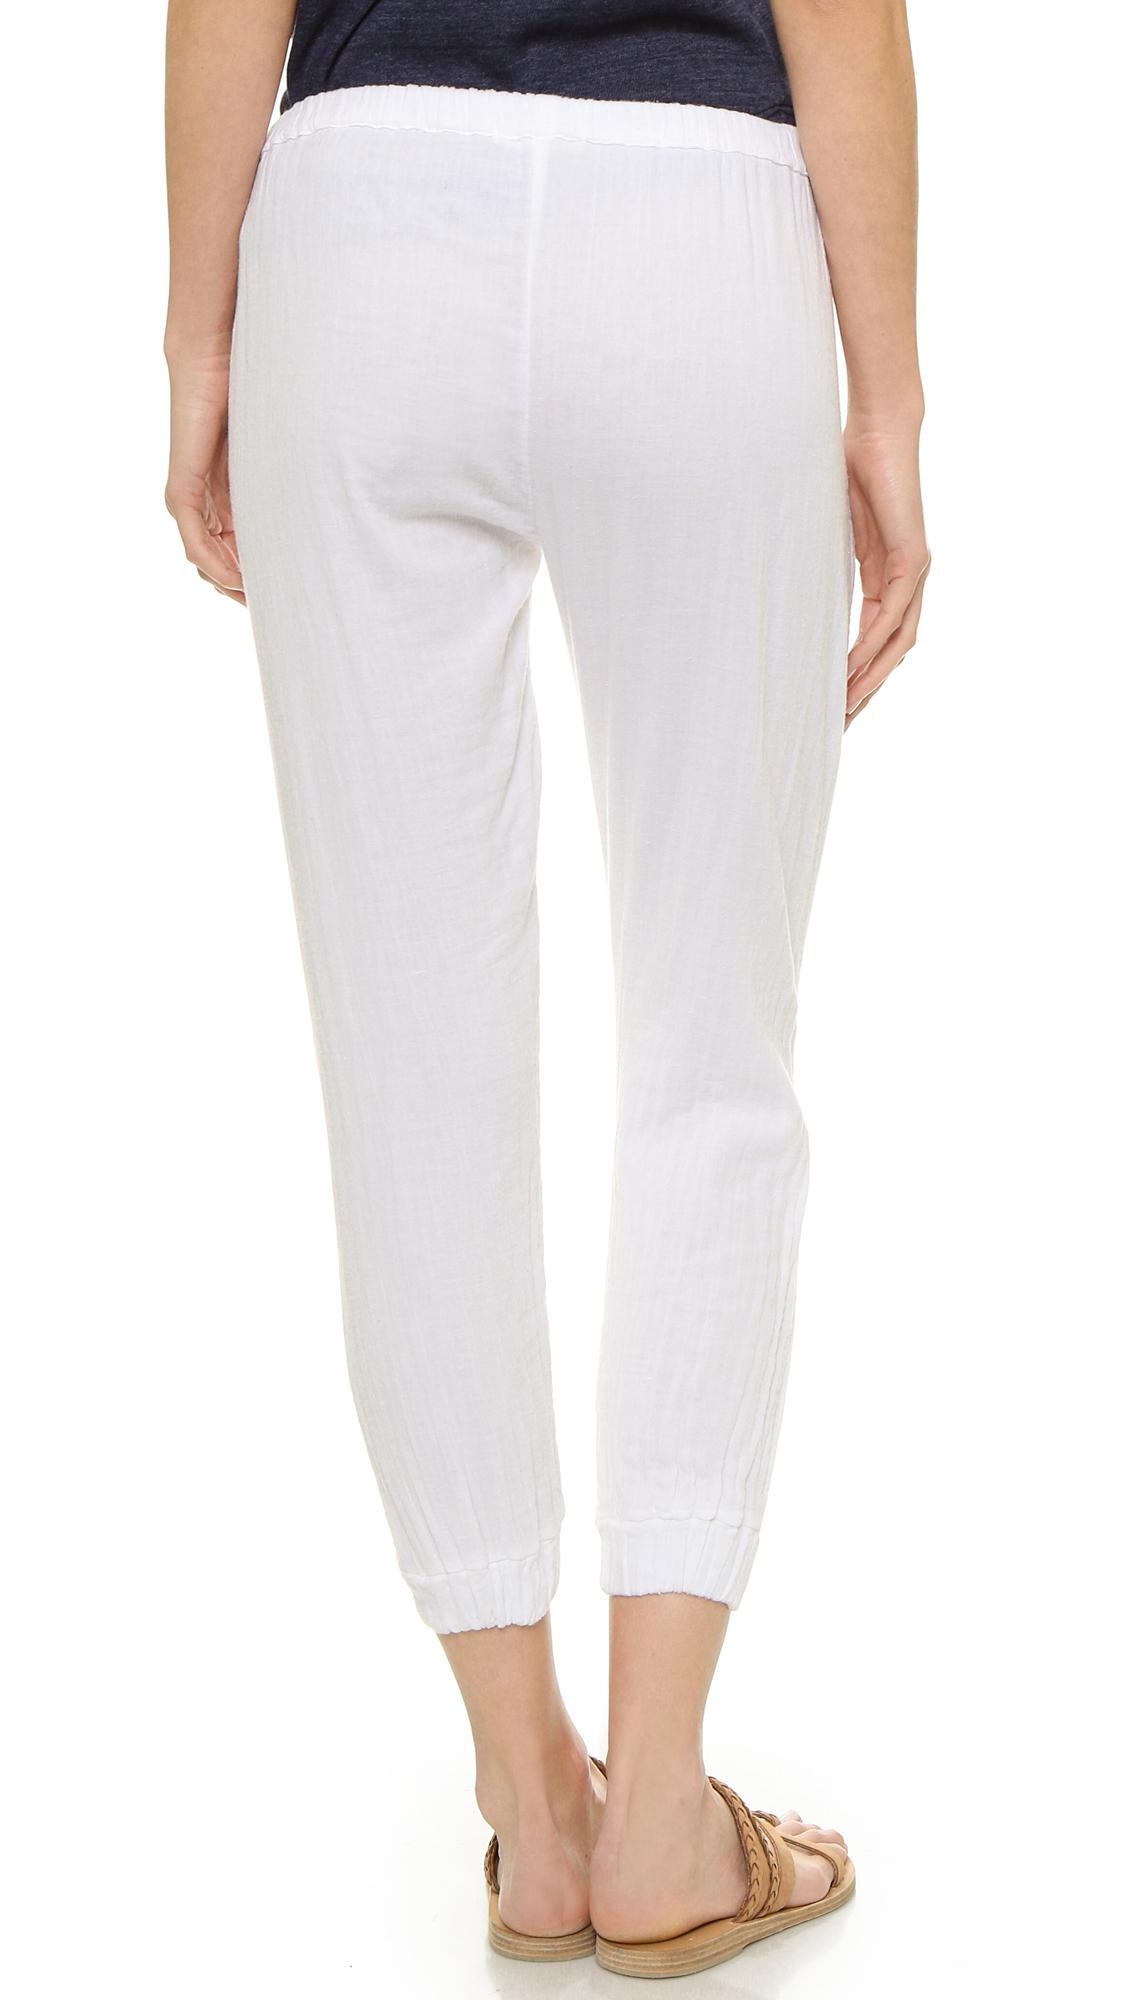 Sundry Gauze Beach Pants - White in White | Lyst